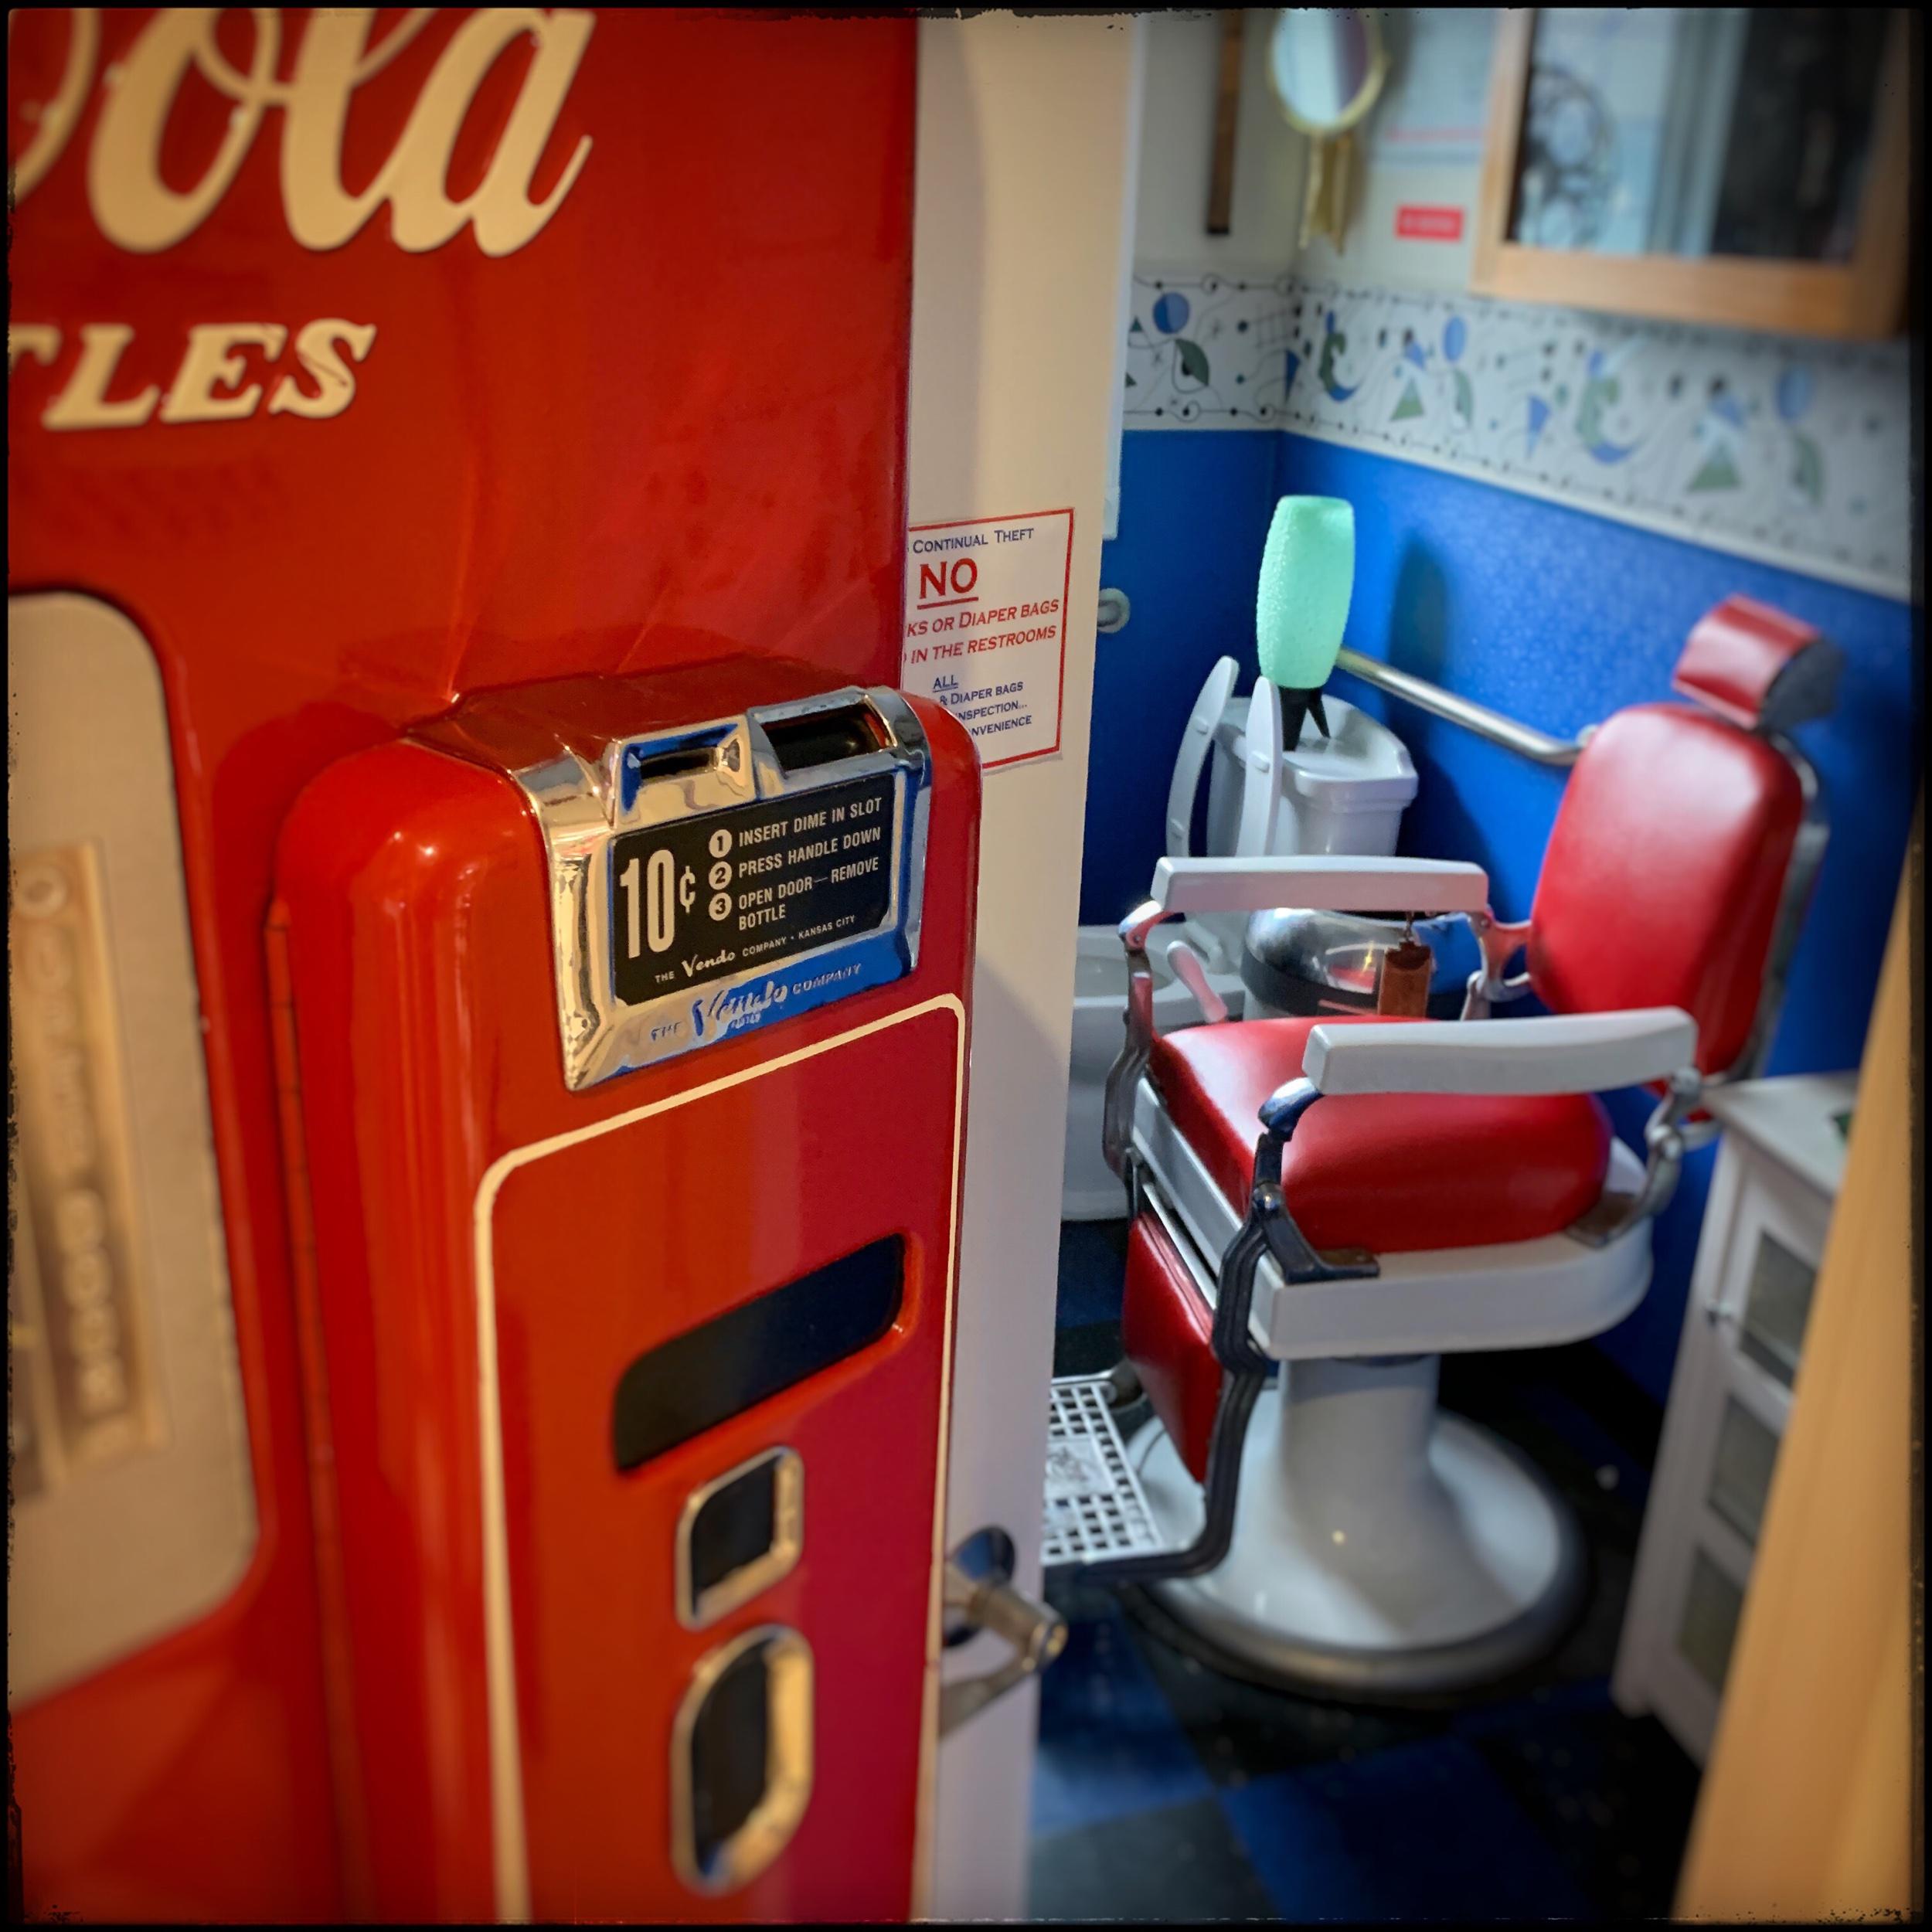 Cool Scoops (ice cream parlor) Mens bathroom   ~ Wildwood, NJ (embiggenable) • iPhone